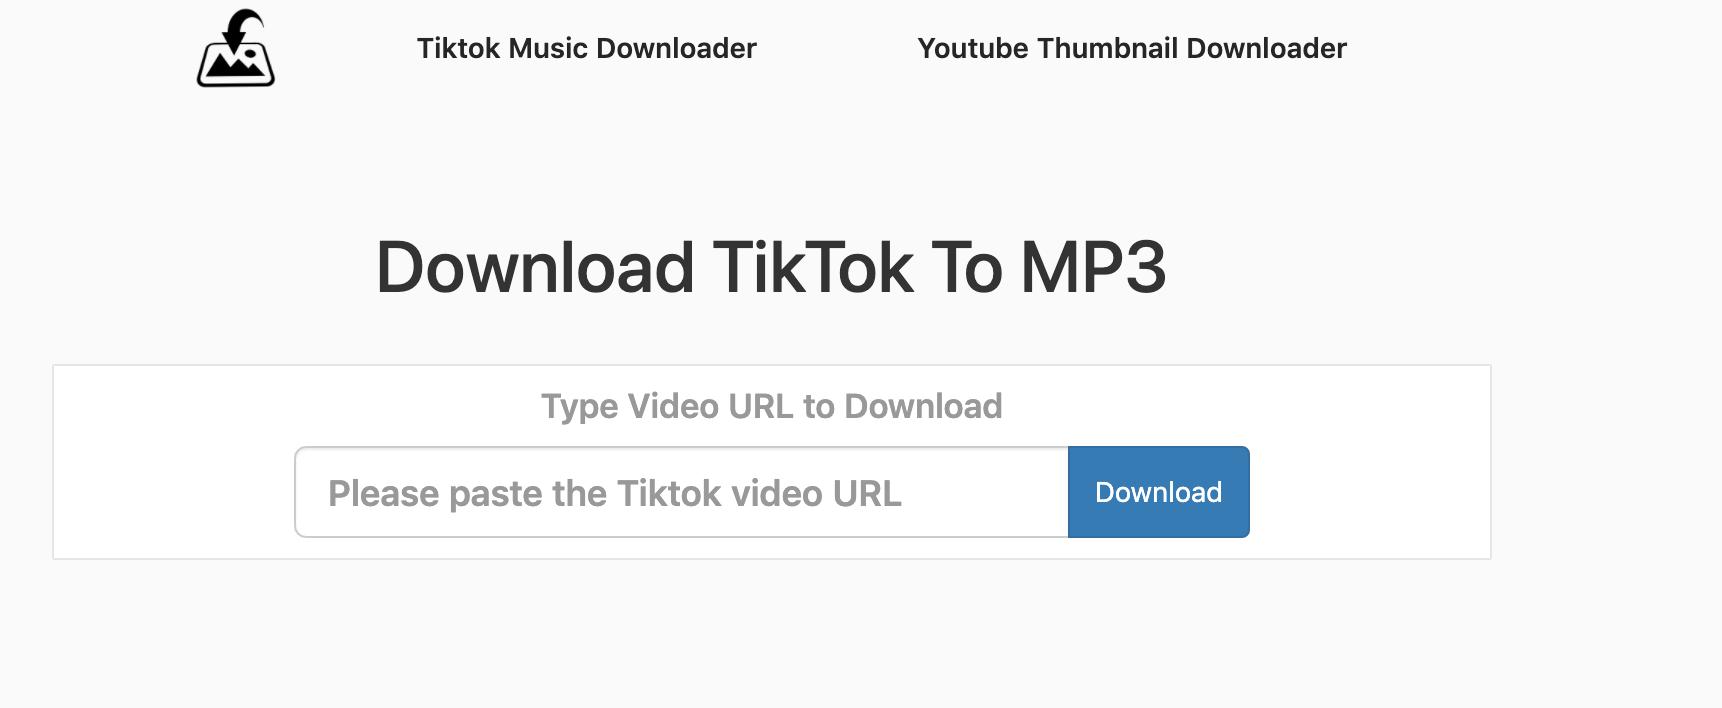 tiktok-music-downloader